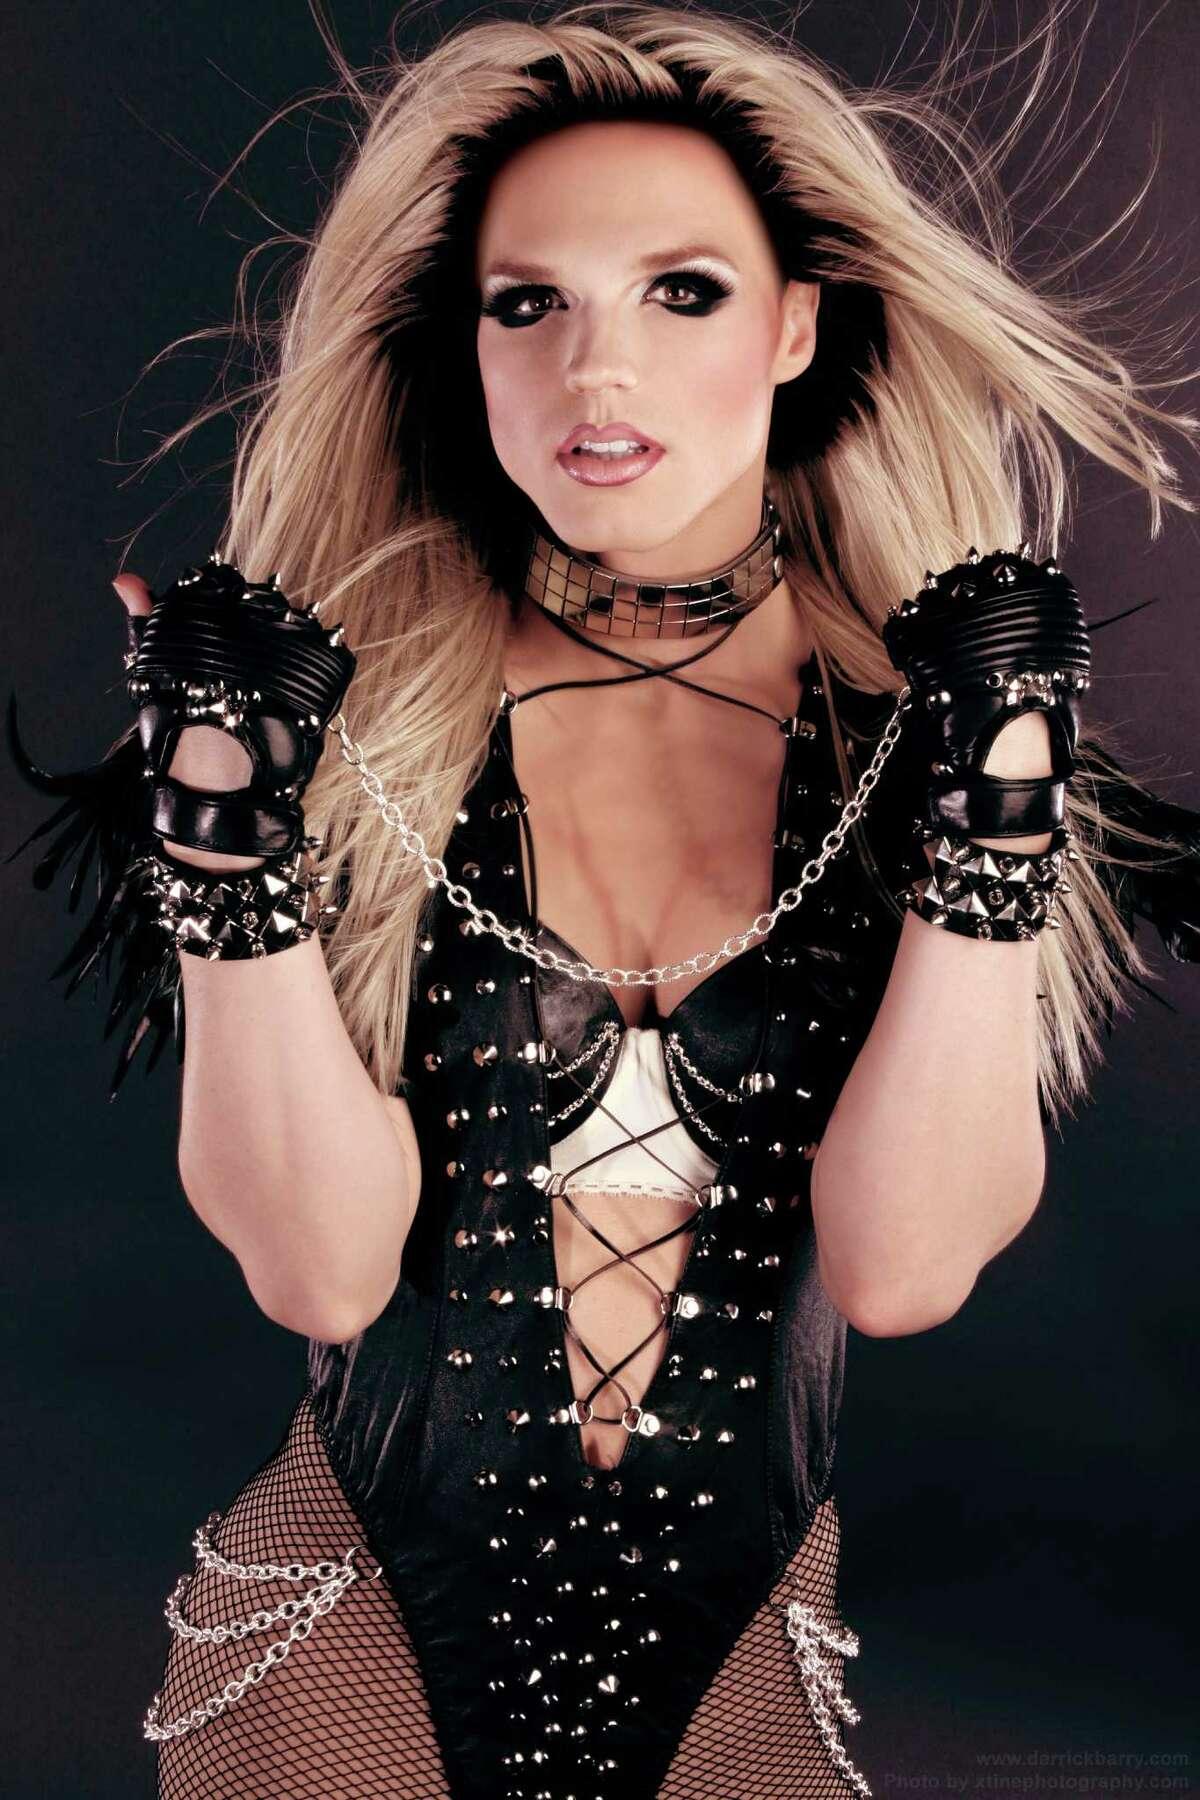 Derrick Barry as Britney Spears Las Vegas, NV